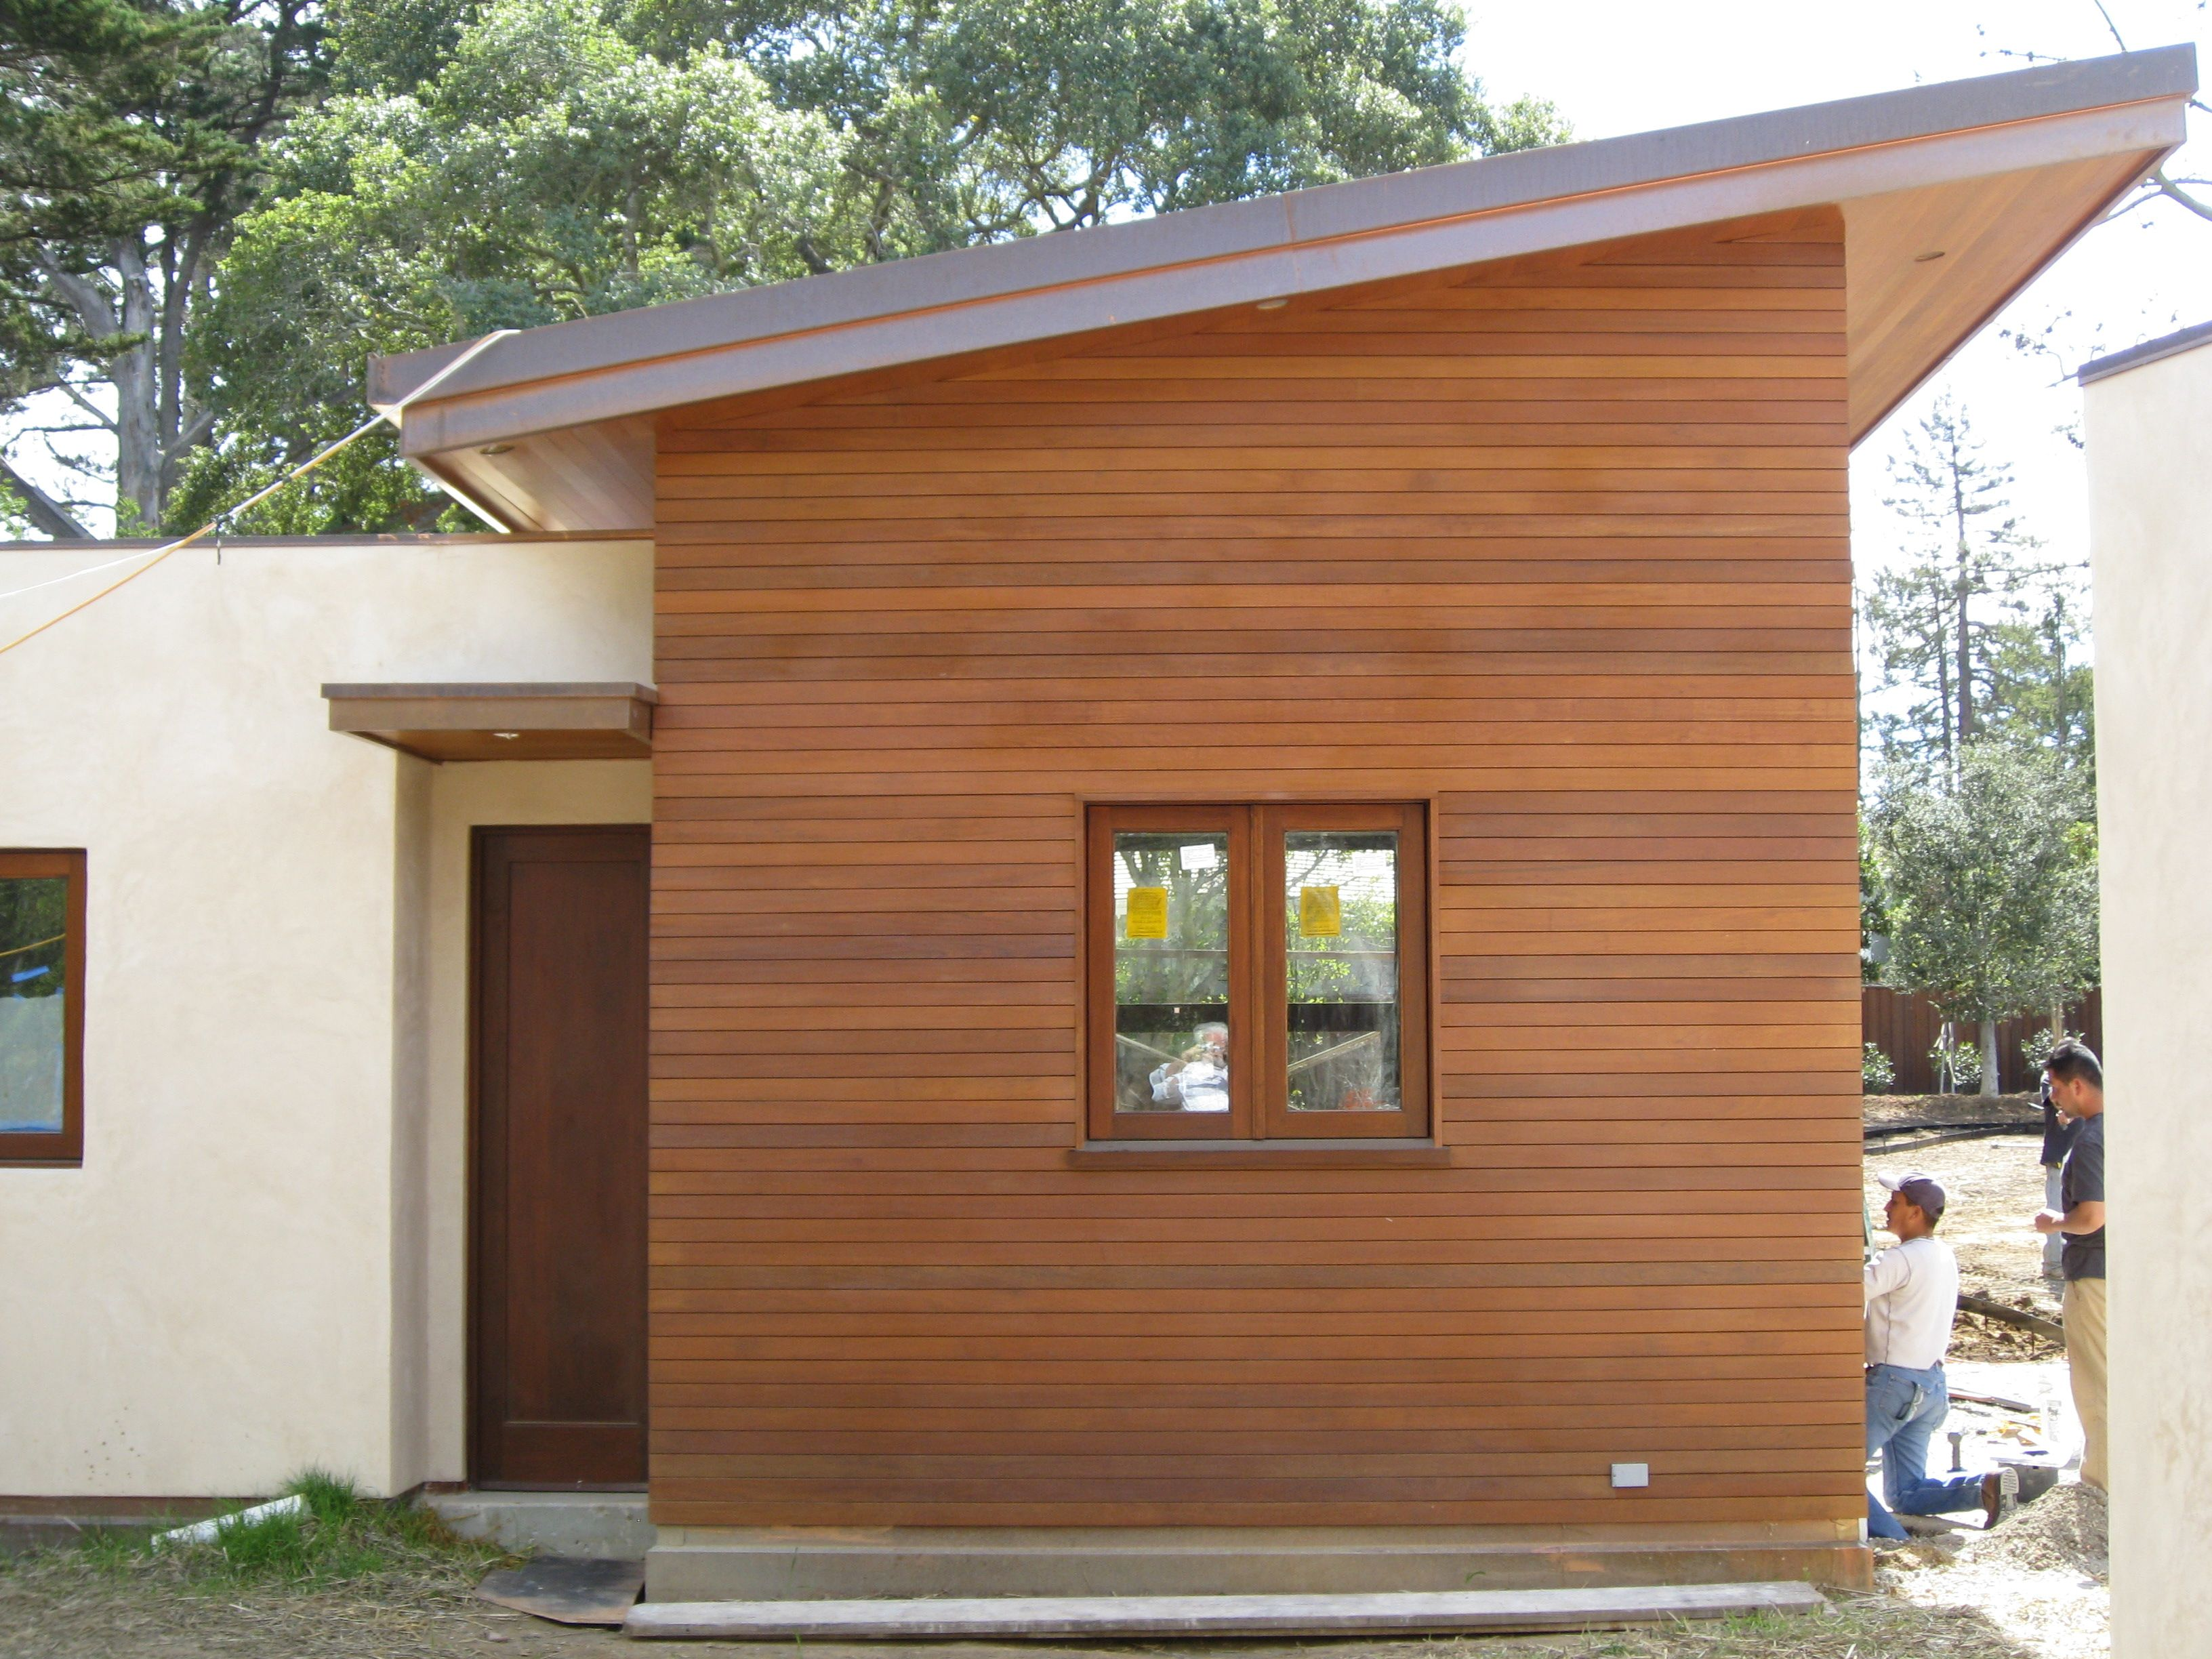 flush wood siding   Music Studio Ideas   Pinterest ... on Contemporary Siding Ideas  id=66725